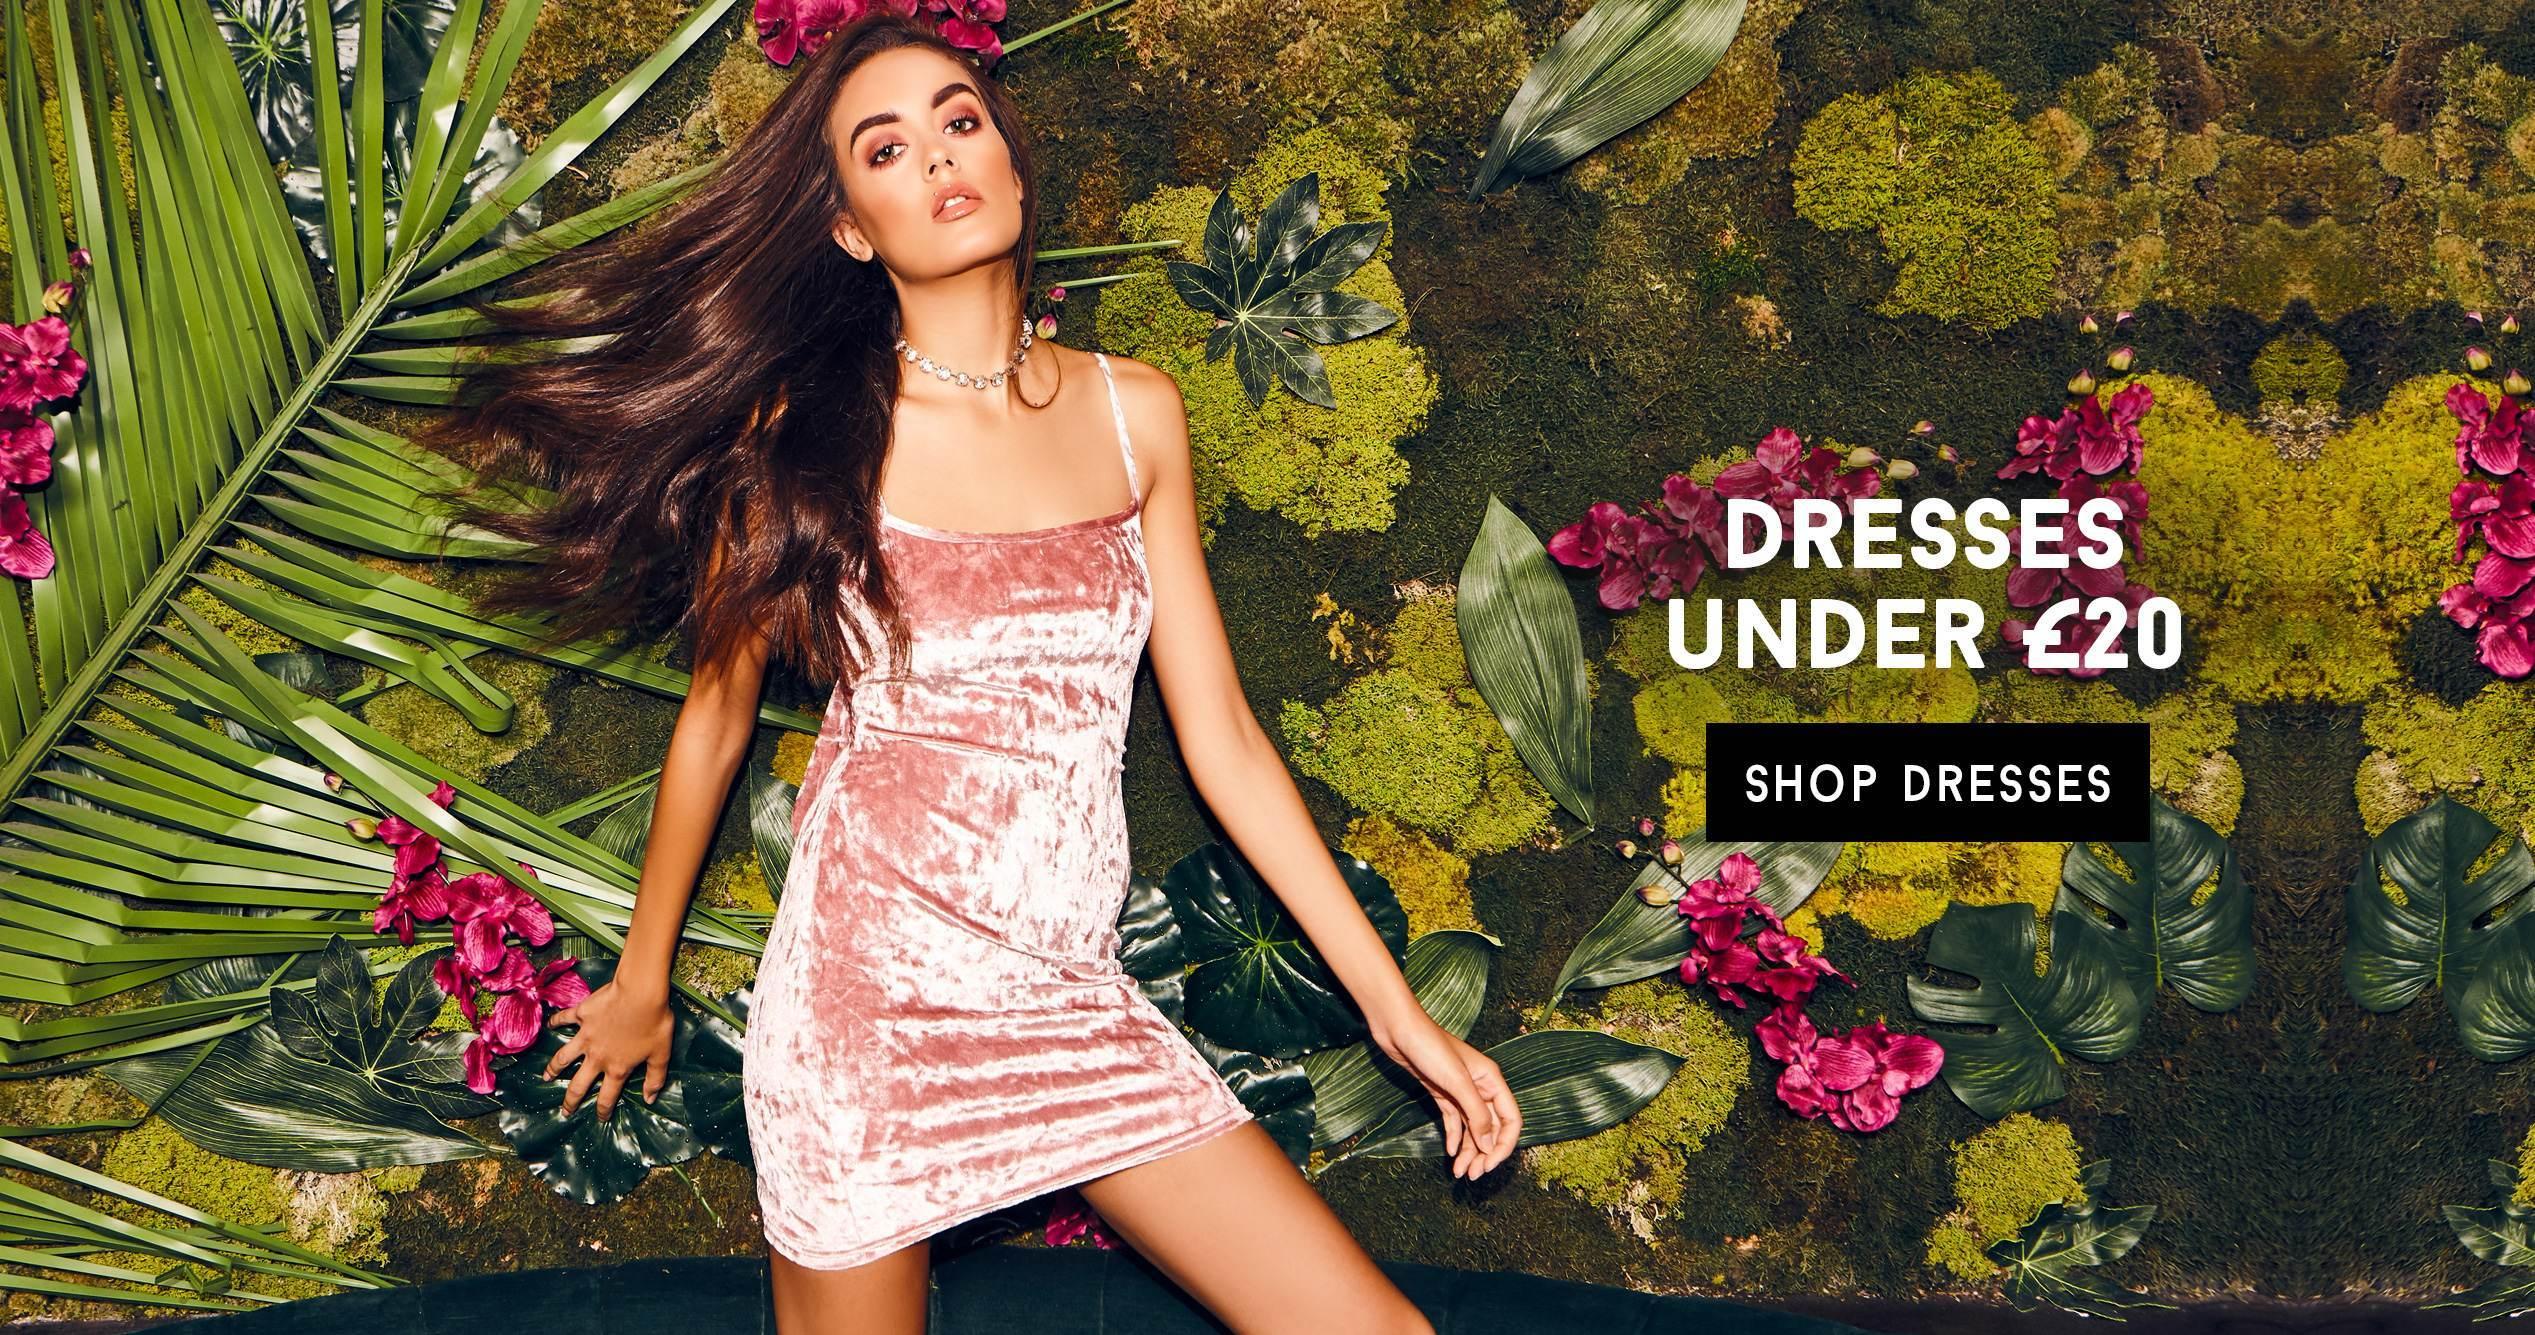 DRESSES UNDER £20